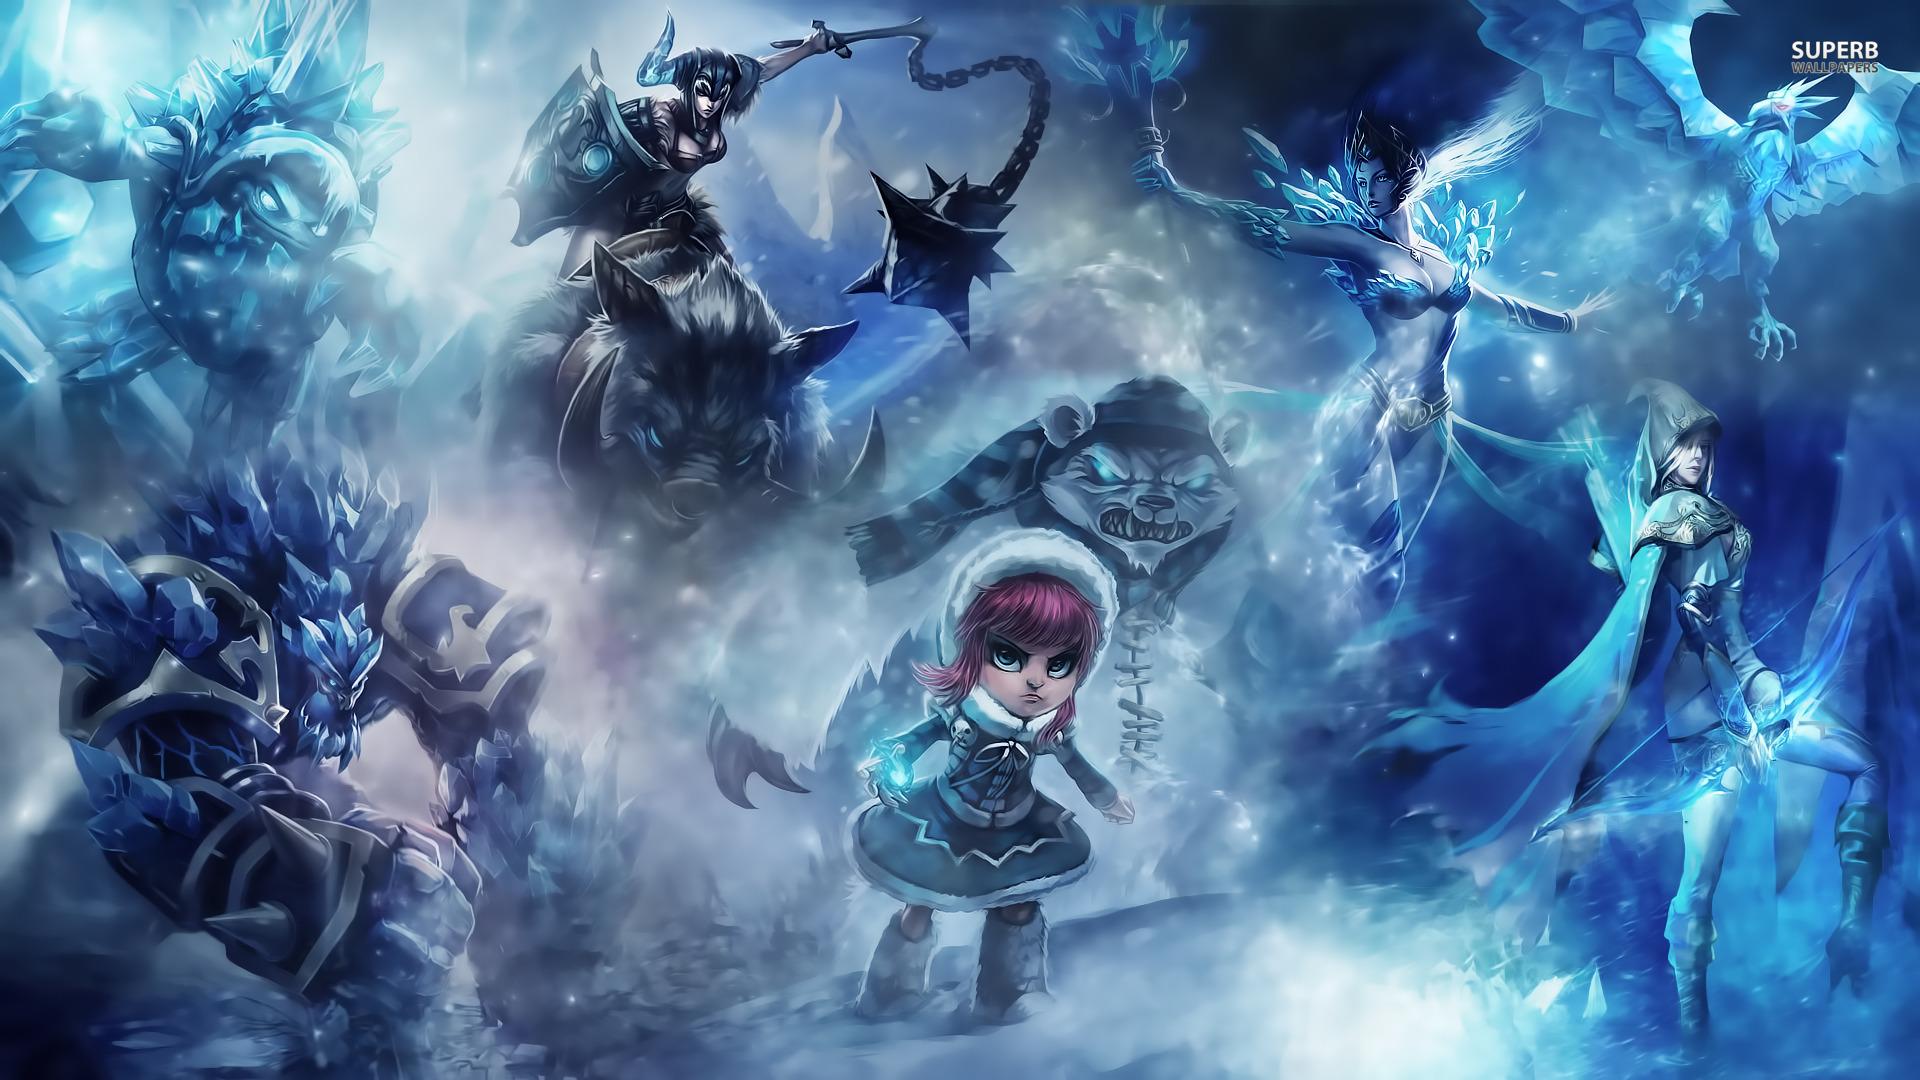 Hd Wallpapers League Of Legends Sf Wallpaper